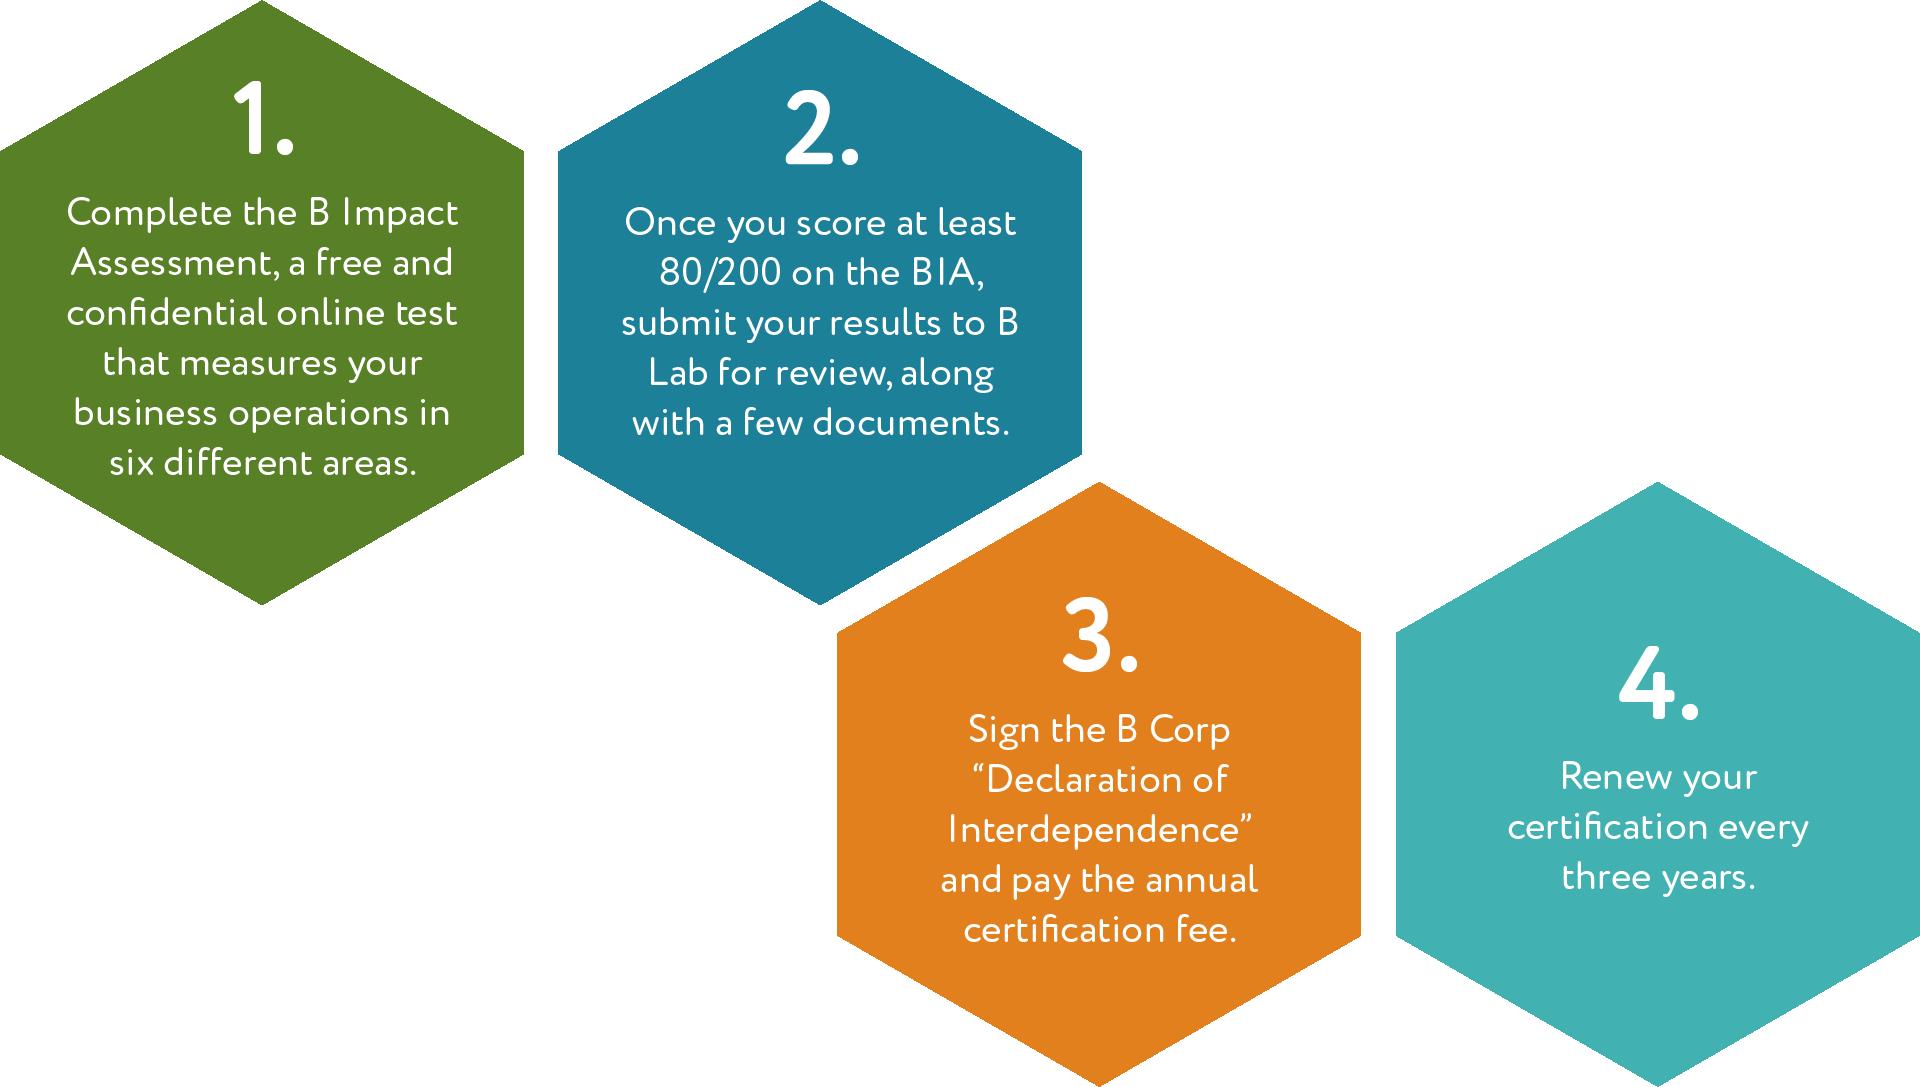 B Corp Certification Process